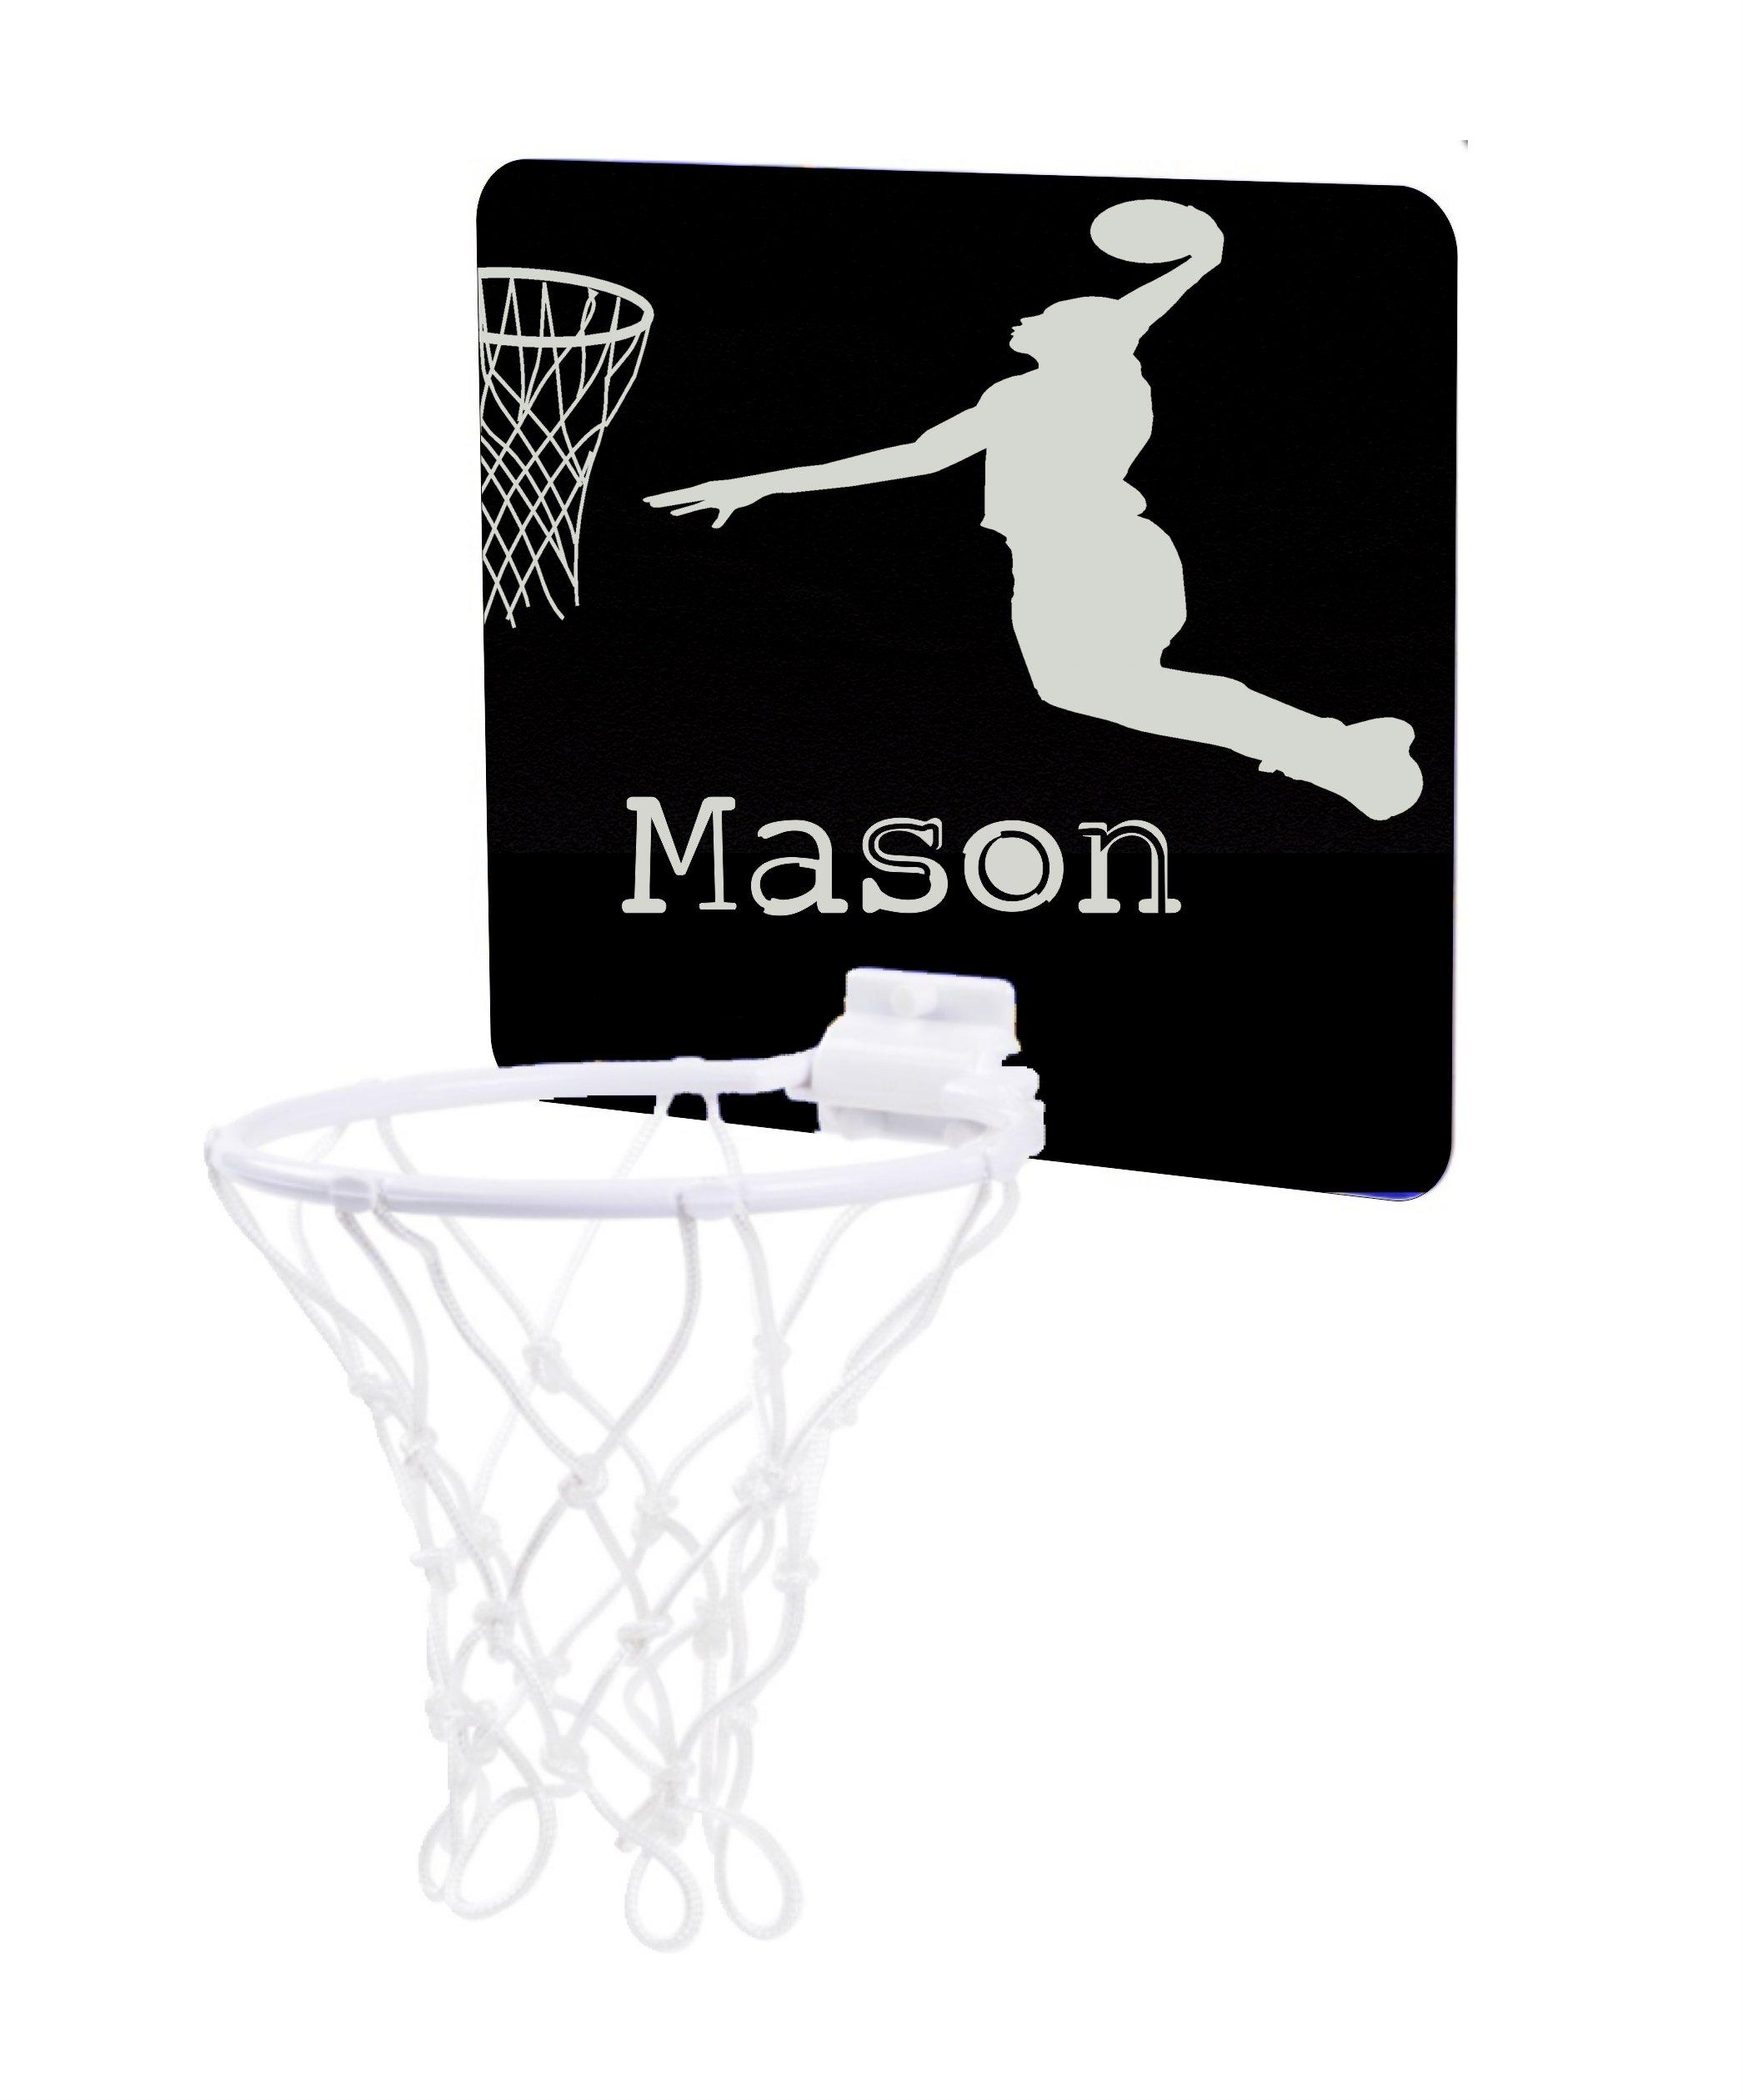 Jacks Outlet Basketball Player Silhouette - Custom Unisex Childrens 7.5'' x 9'' Mini Basketball Backboard - Goal with 6'' Hoop